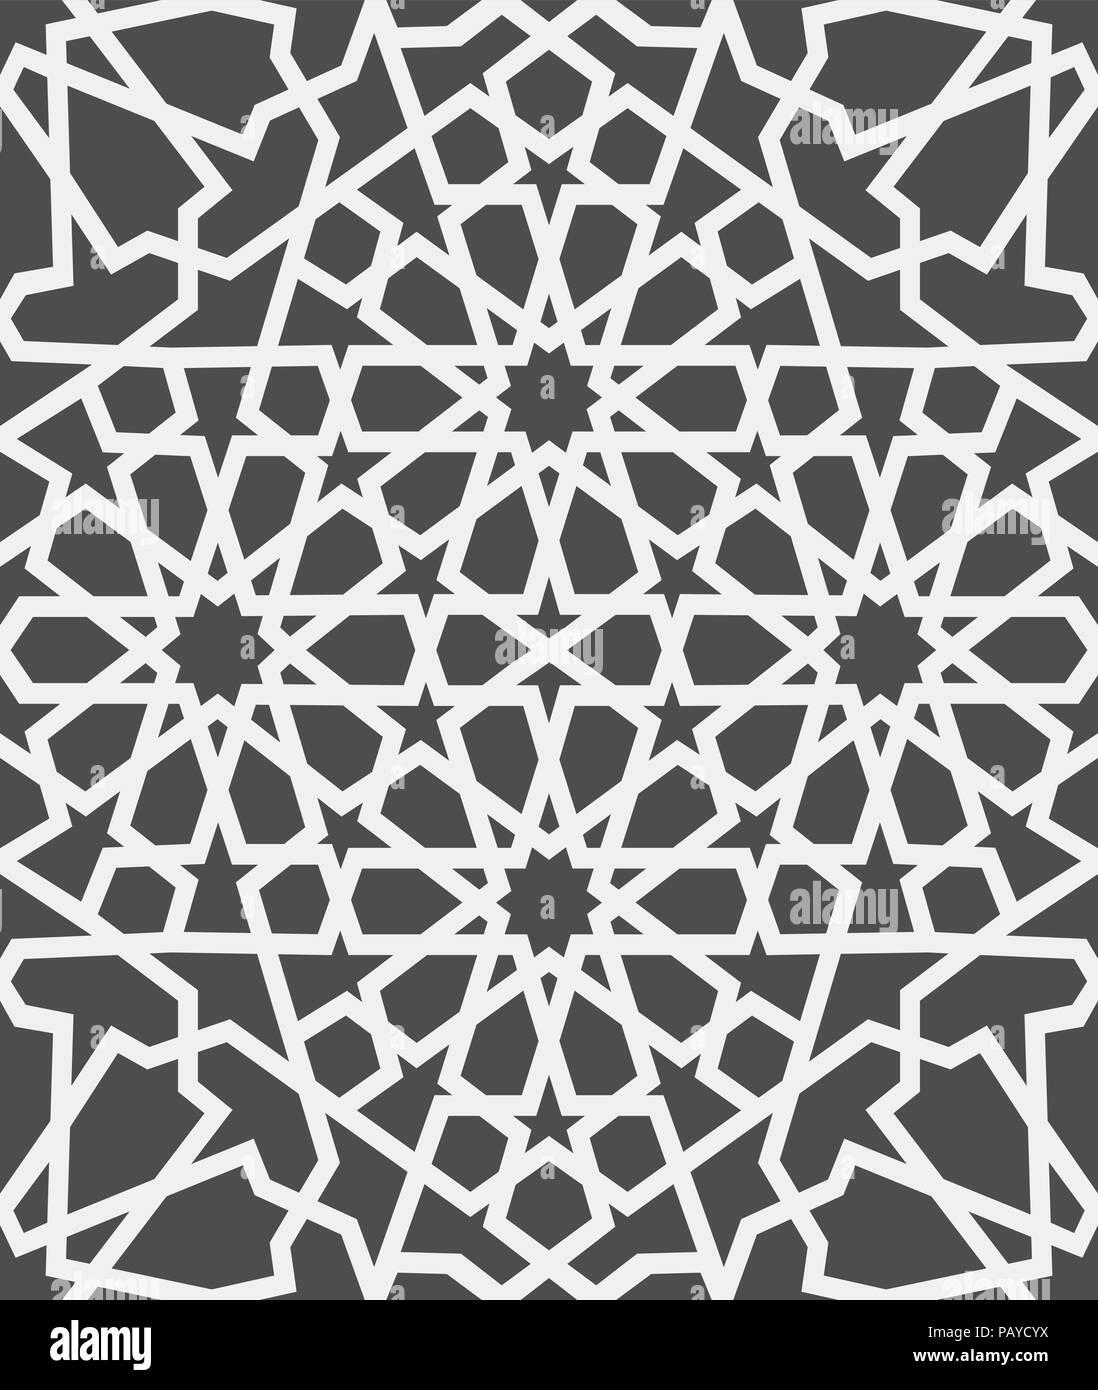 Pattern Fills Imágenes De Stock & Pattern Fills Fotos De Stock ...